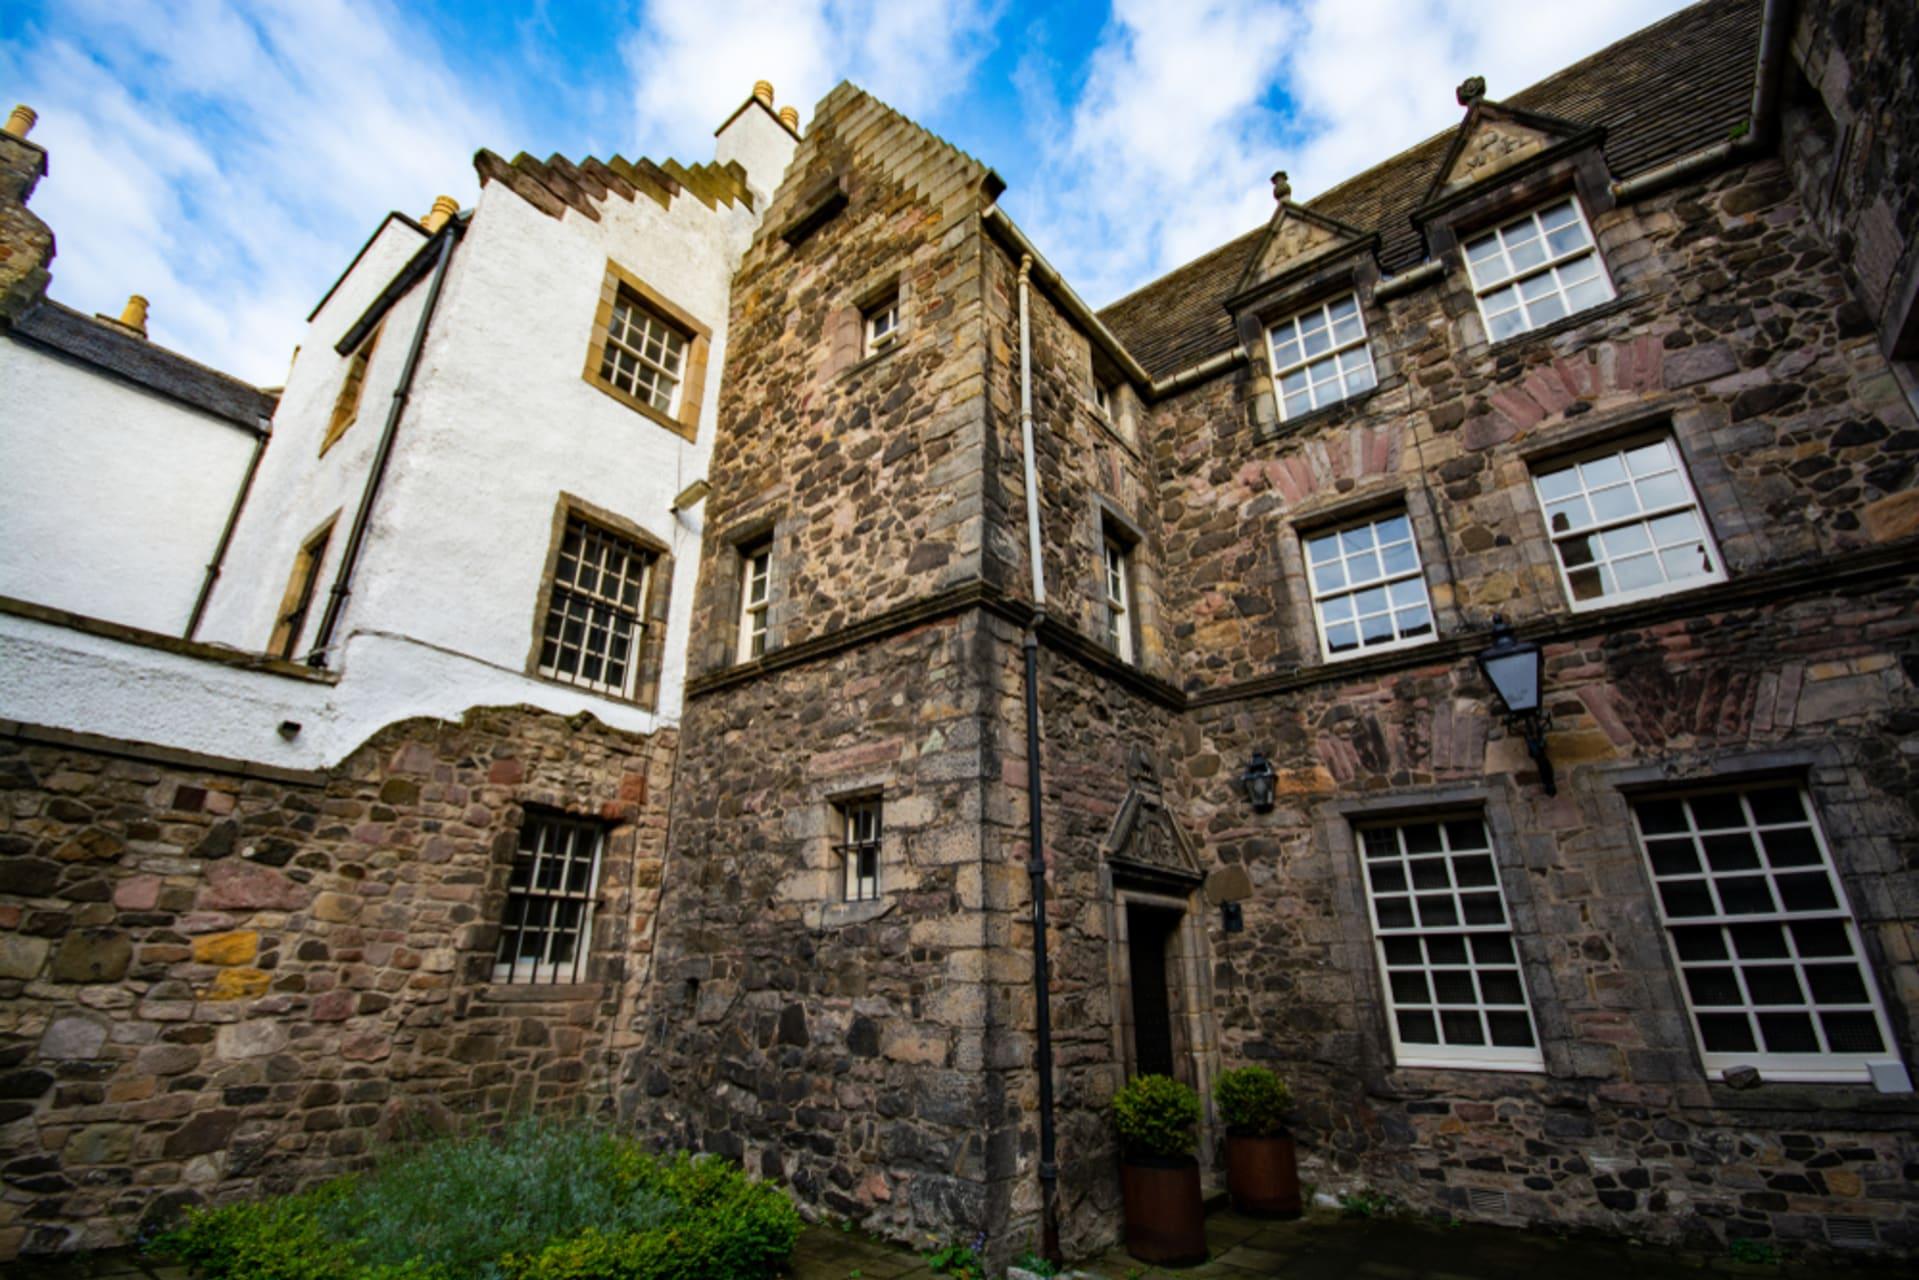 Edinburgh - Outlander Film locations